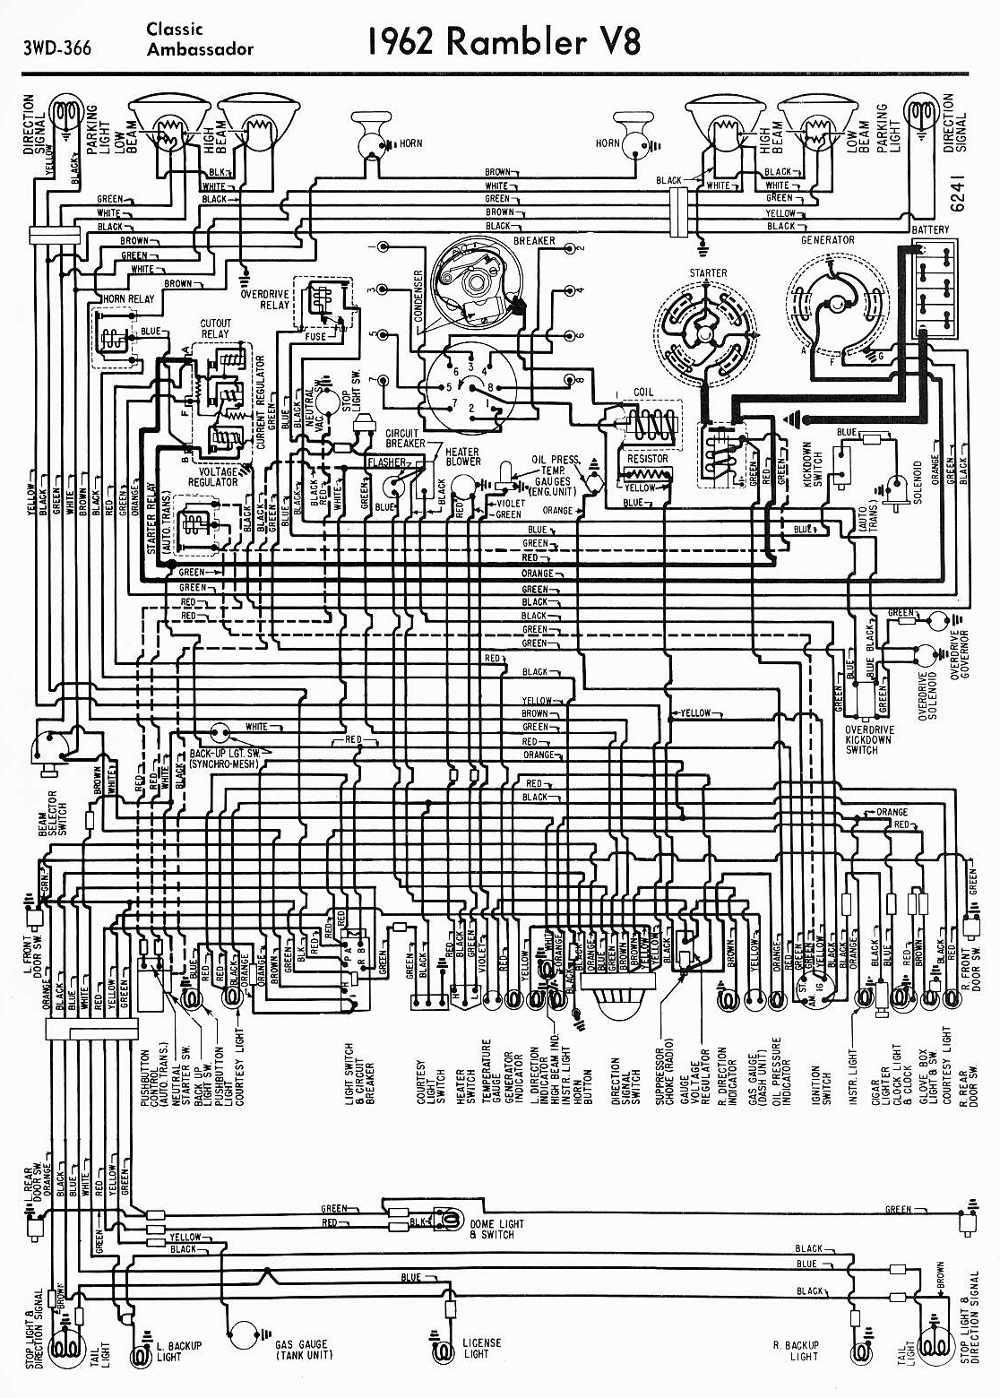 small resolution of amc car manuals wiring diagrams pdf fault codes 1973 amc ambassador 1973 amc wiring diagram